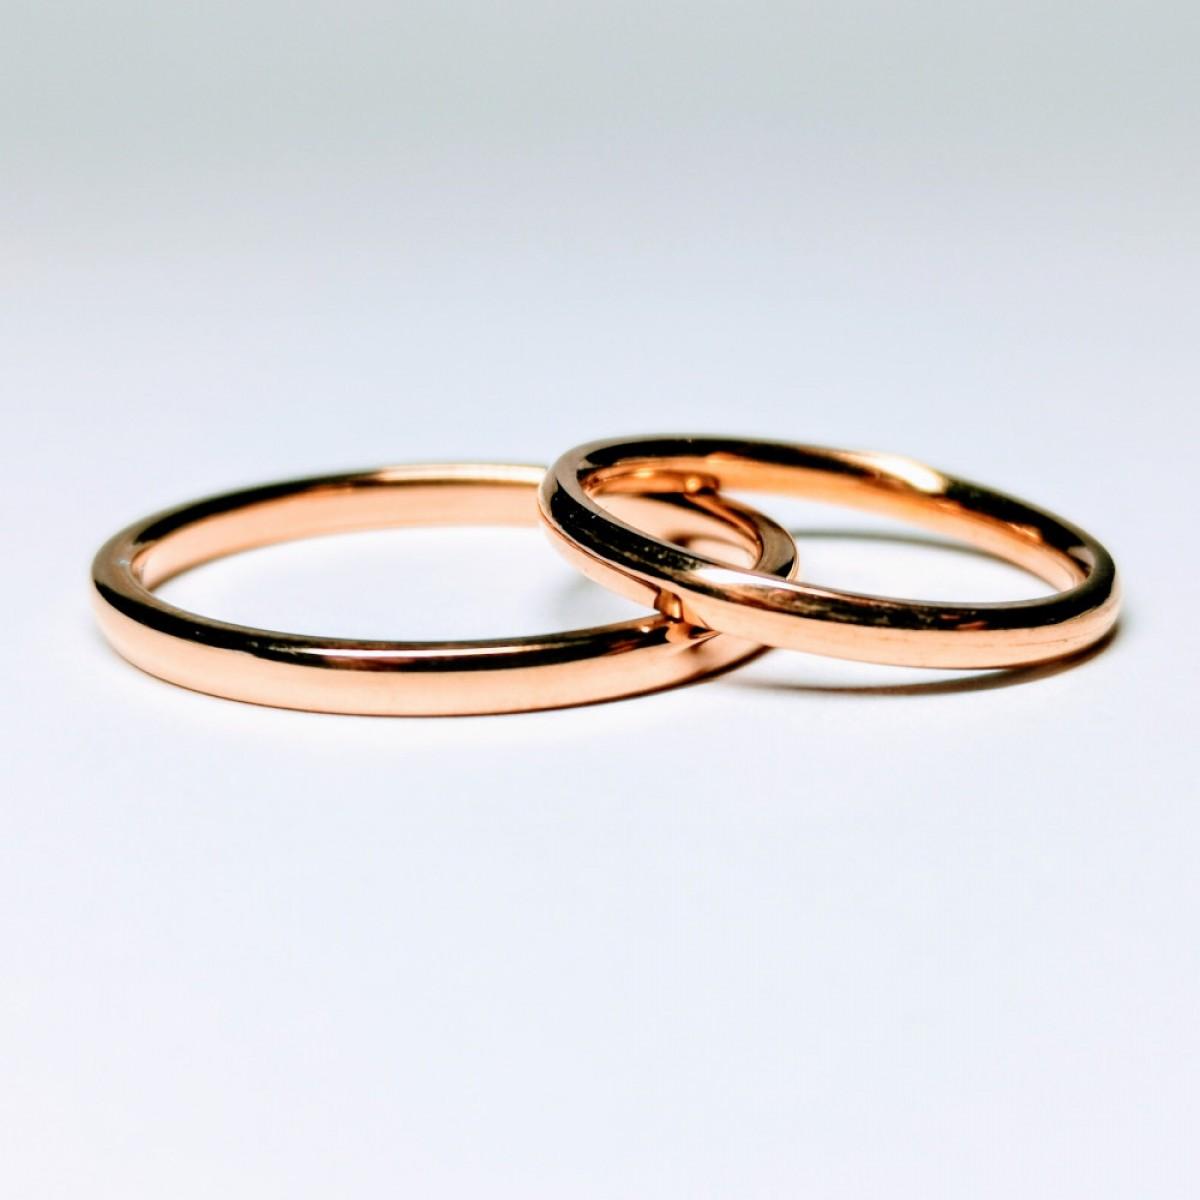 Verighete subtiri din aur roz